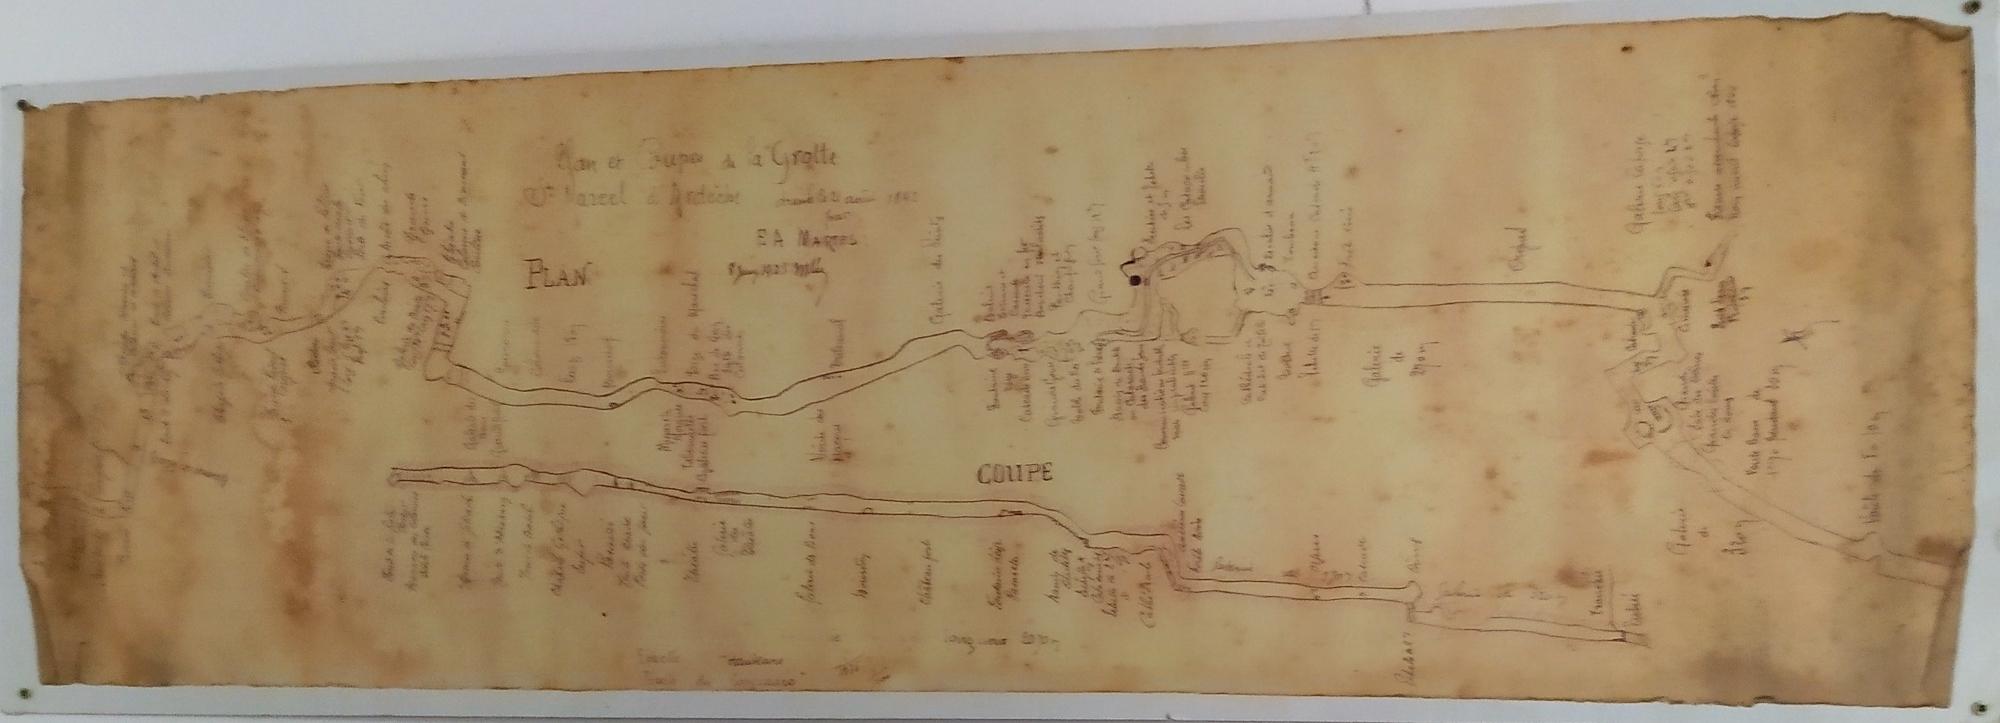 saint marcel cave network topography E.A.Martel